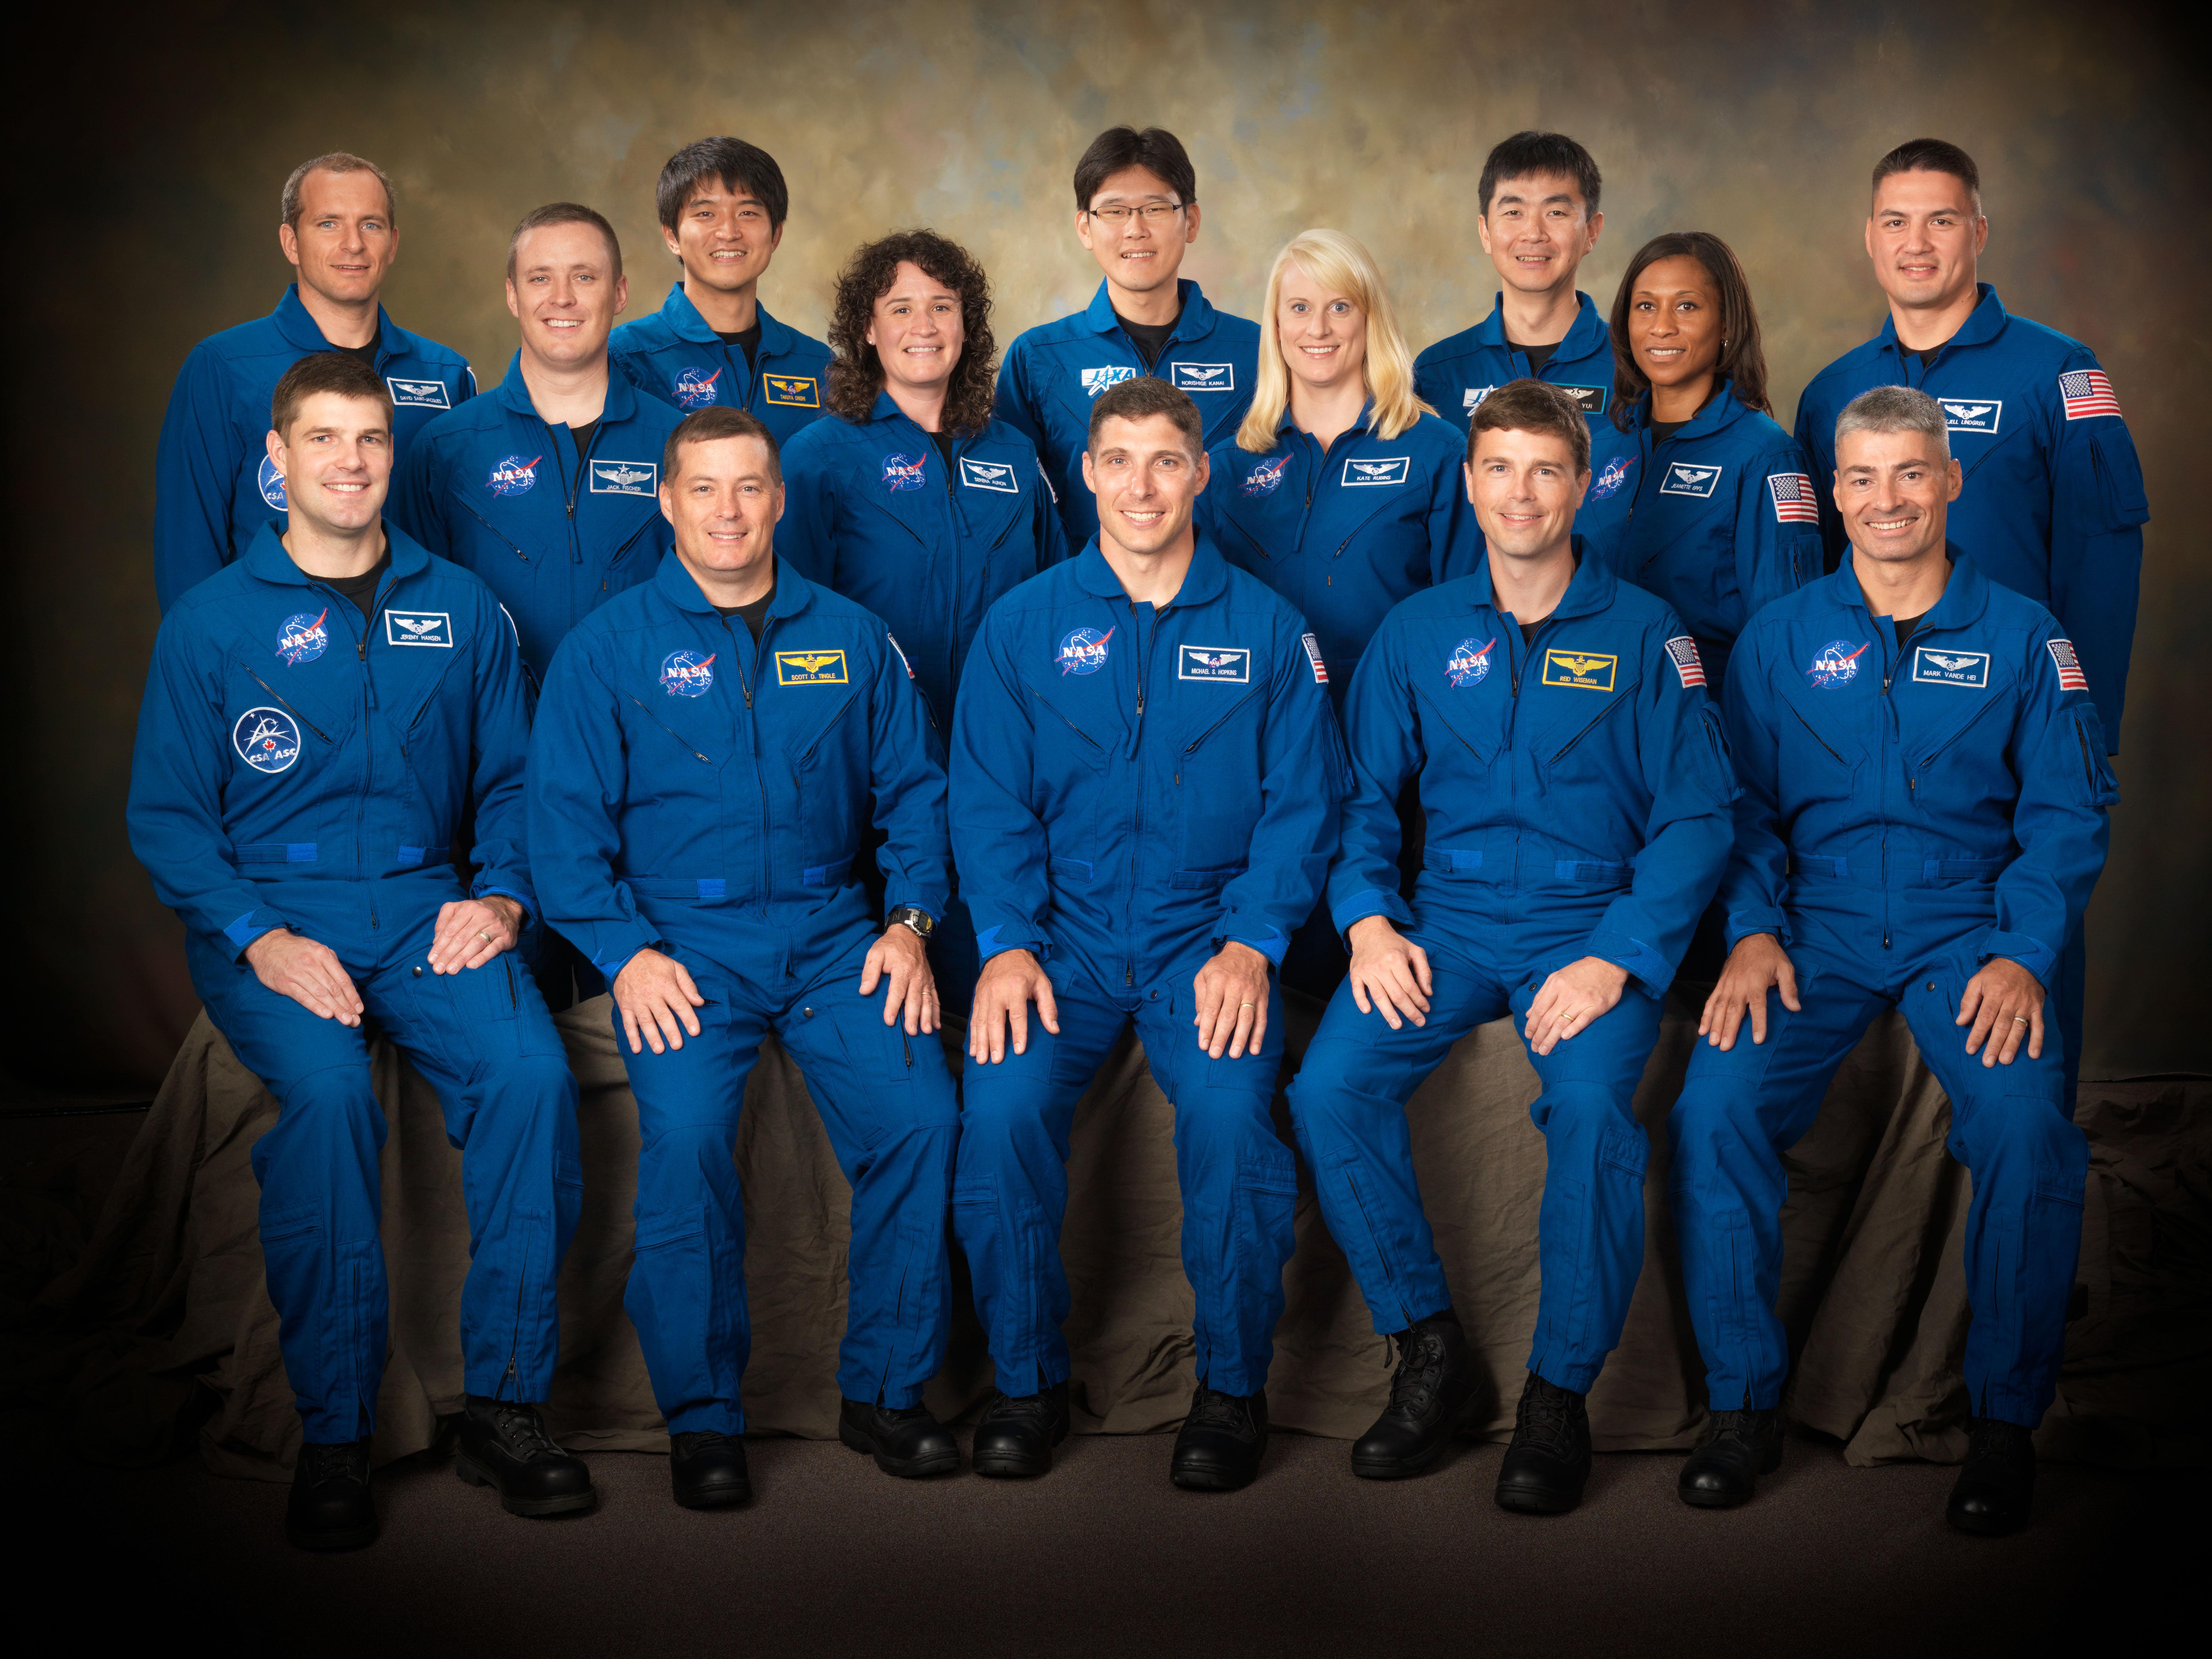 astronaut corps - photo #40